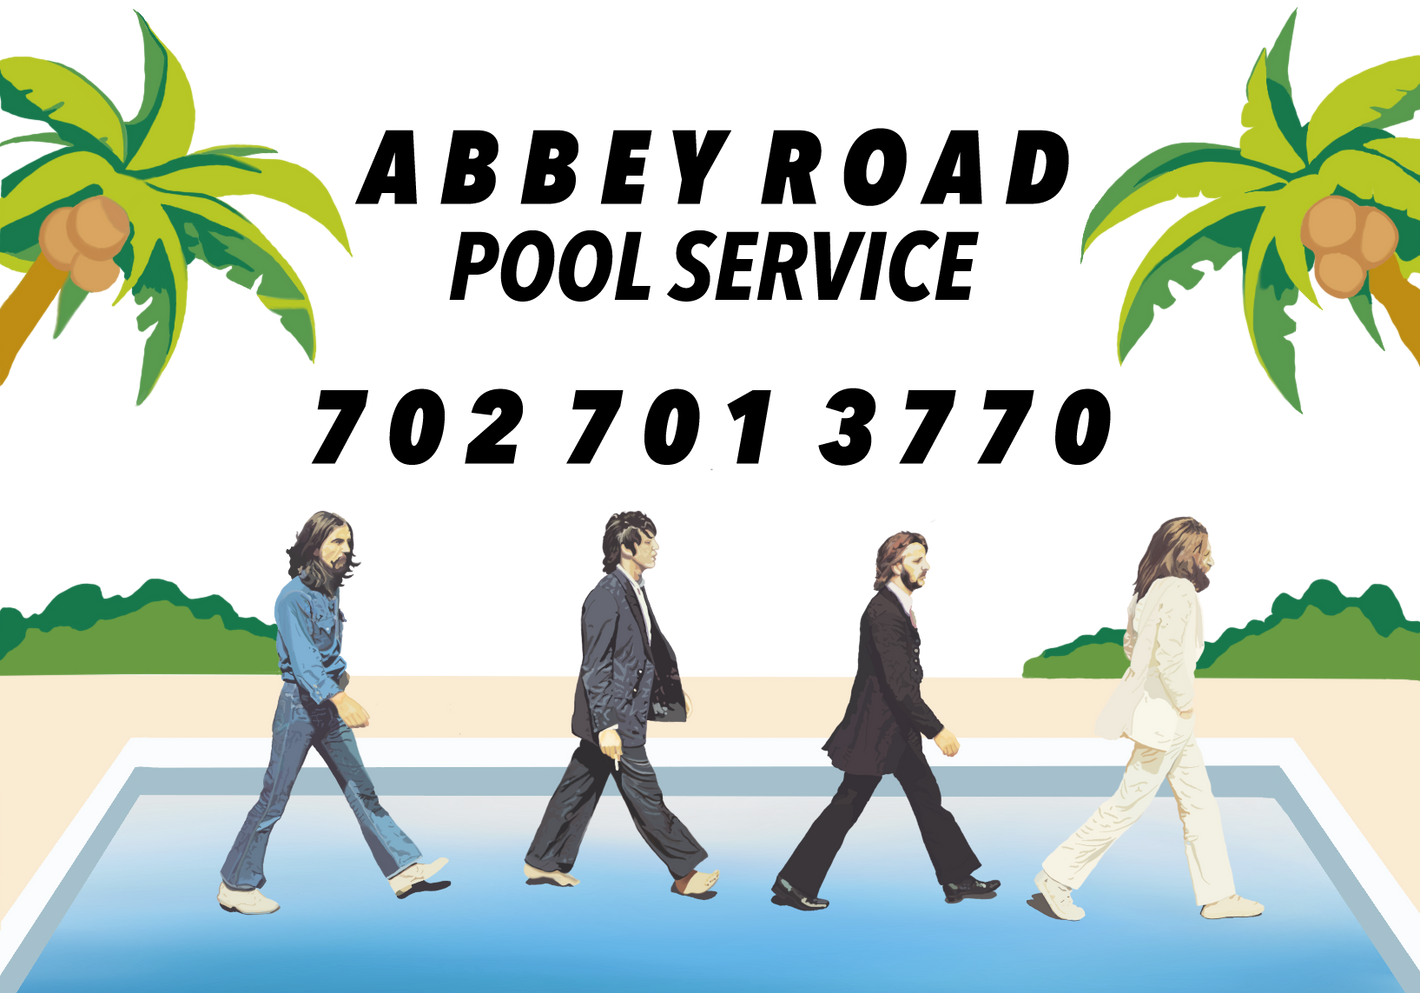 Abbey Road Pool Service Co